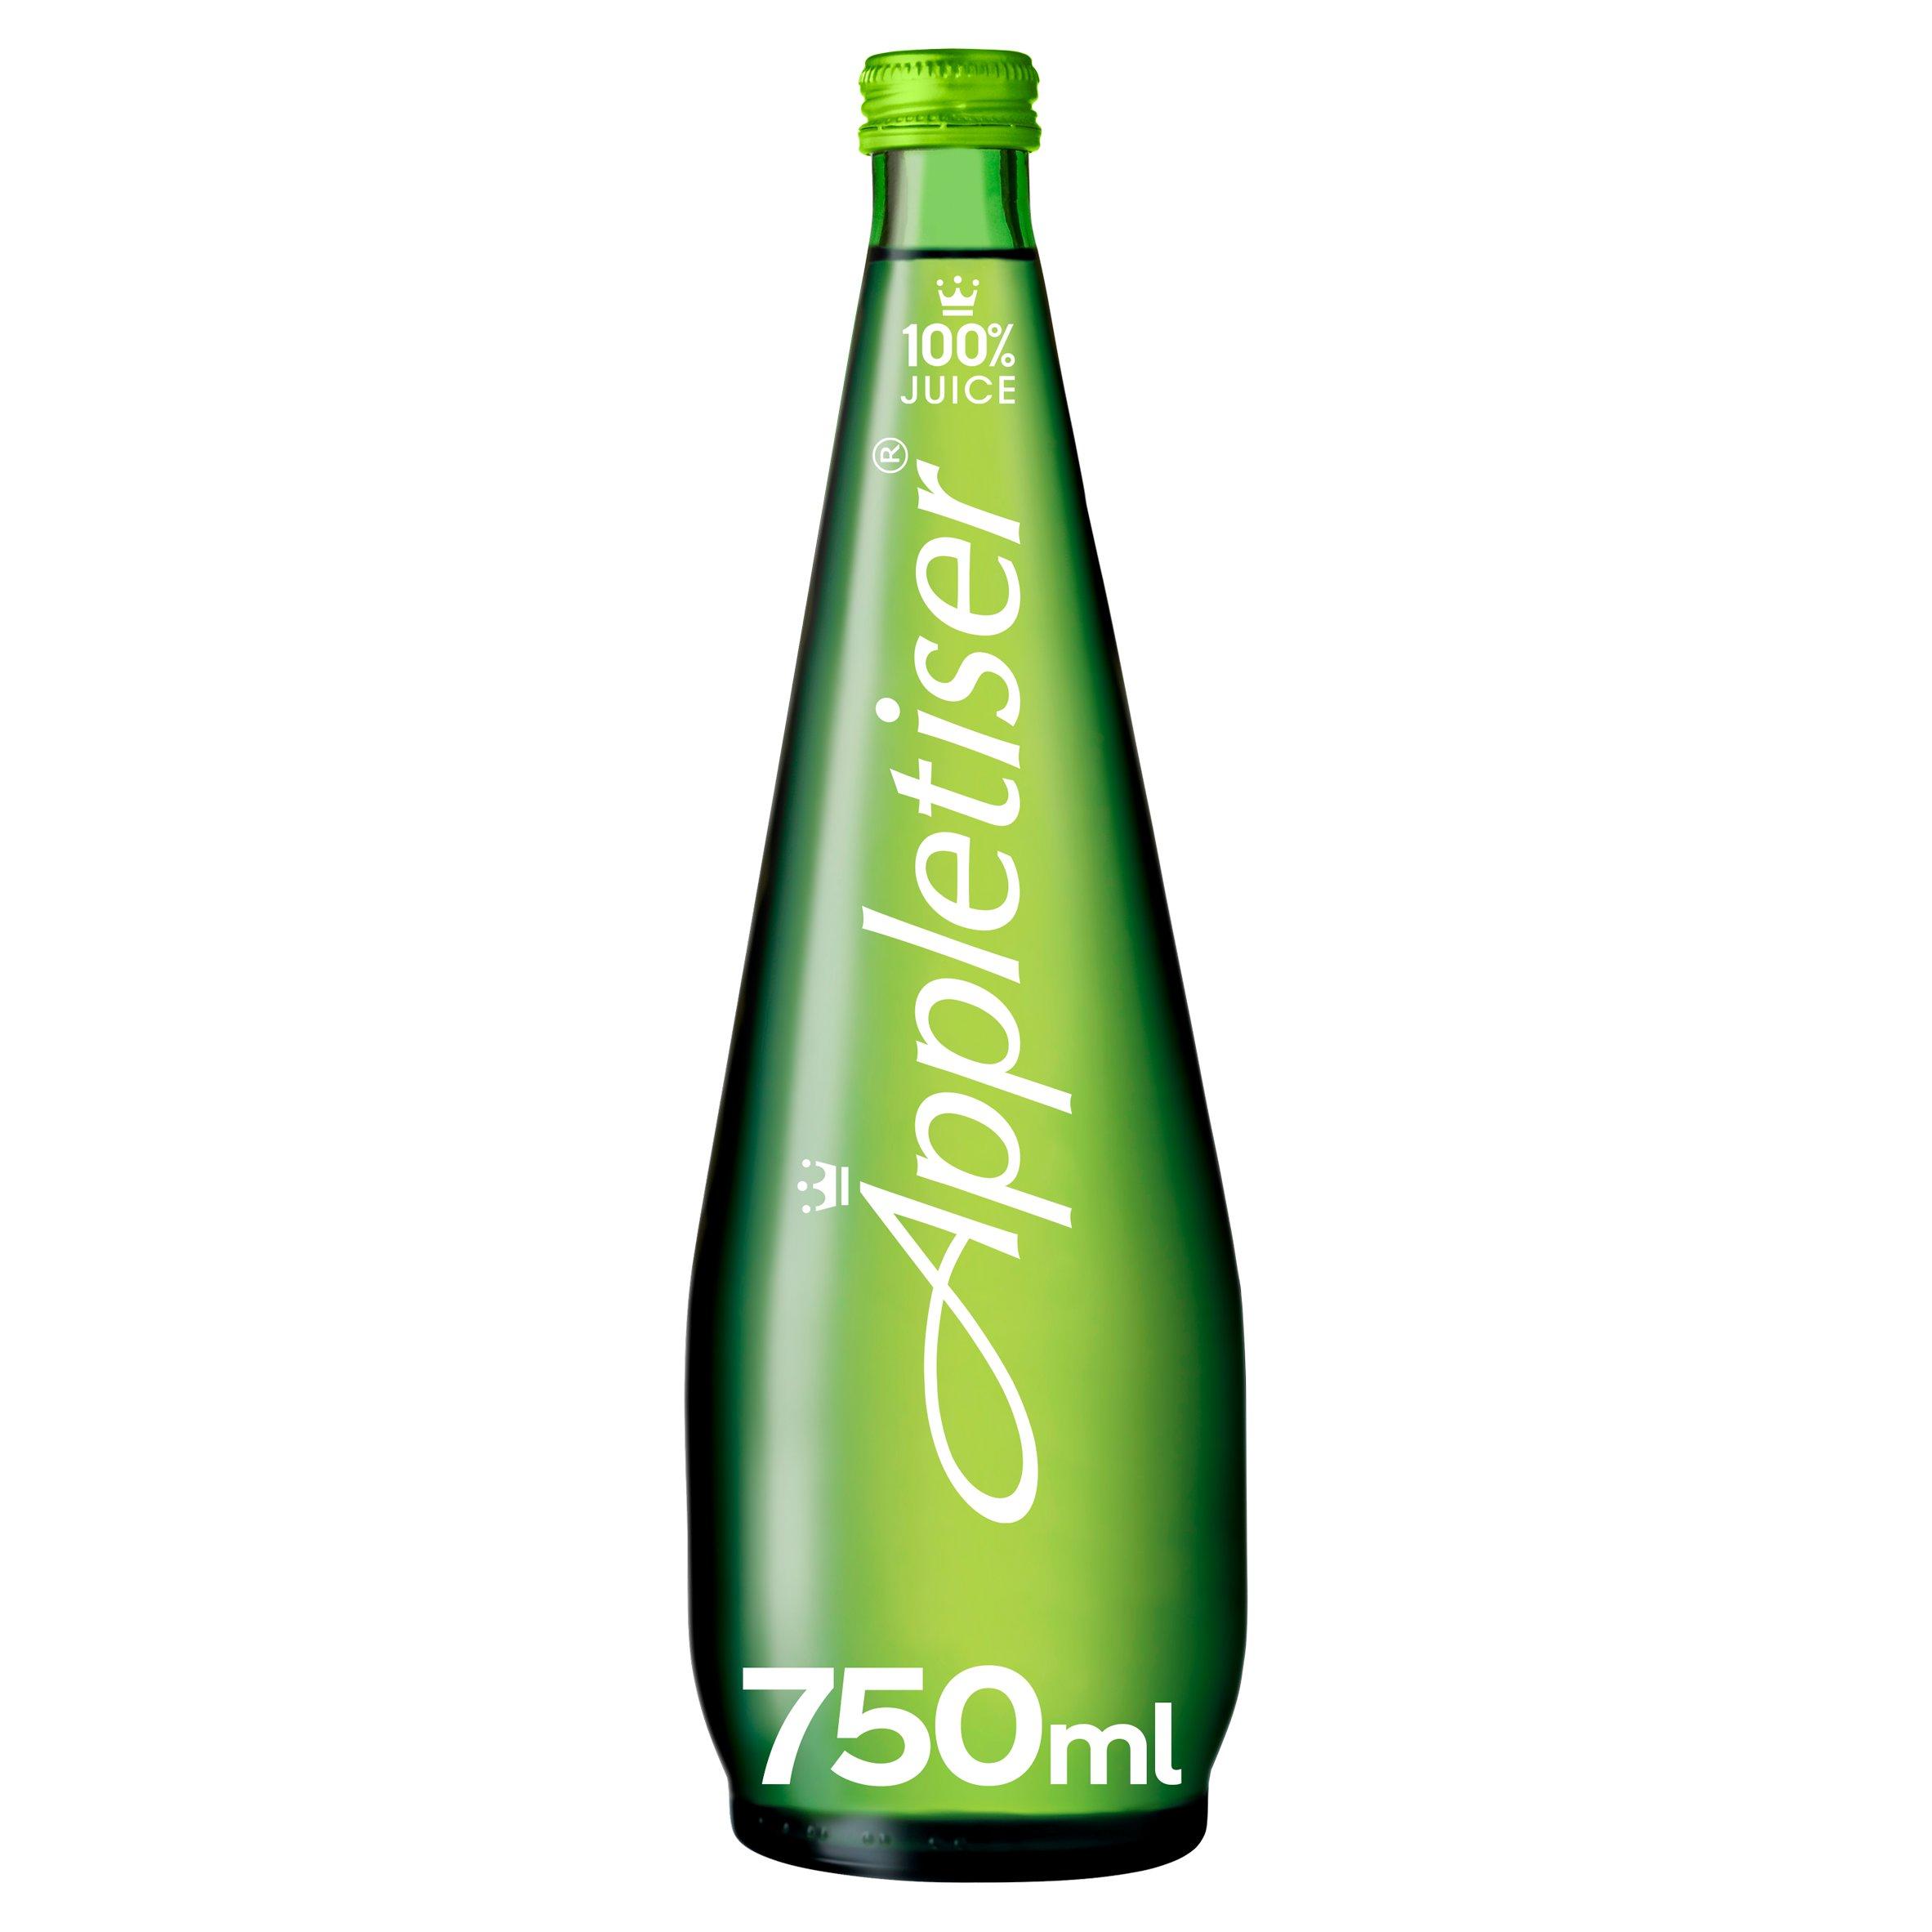 Appletiser Sparkling Apple Juice 750 Ml